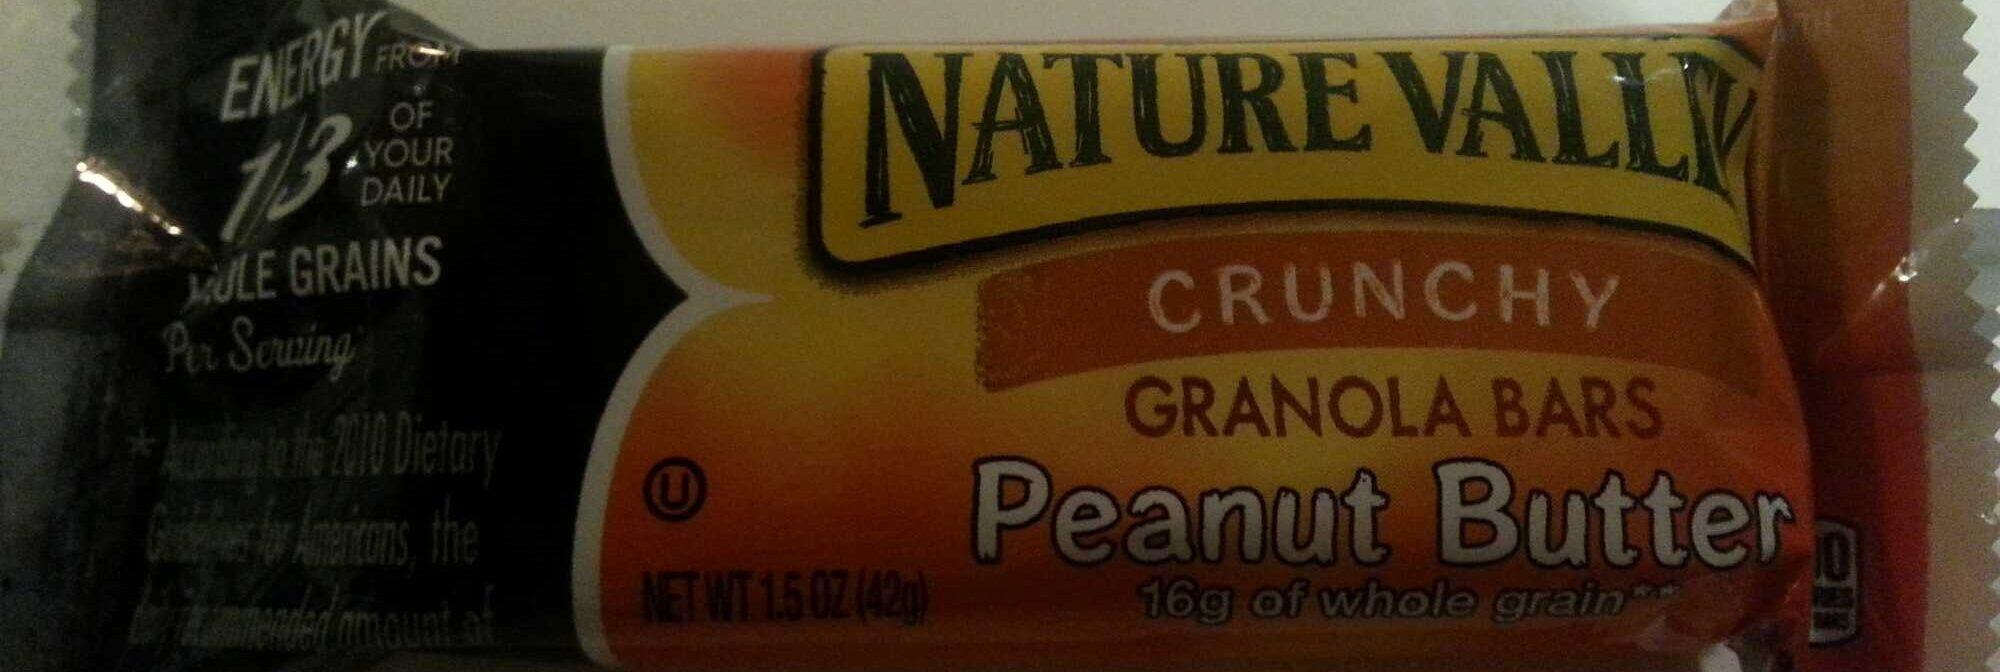 Crunchy Peanut Butter Granola Bar - Product - en